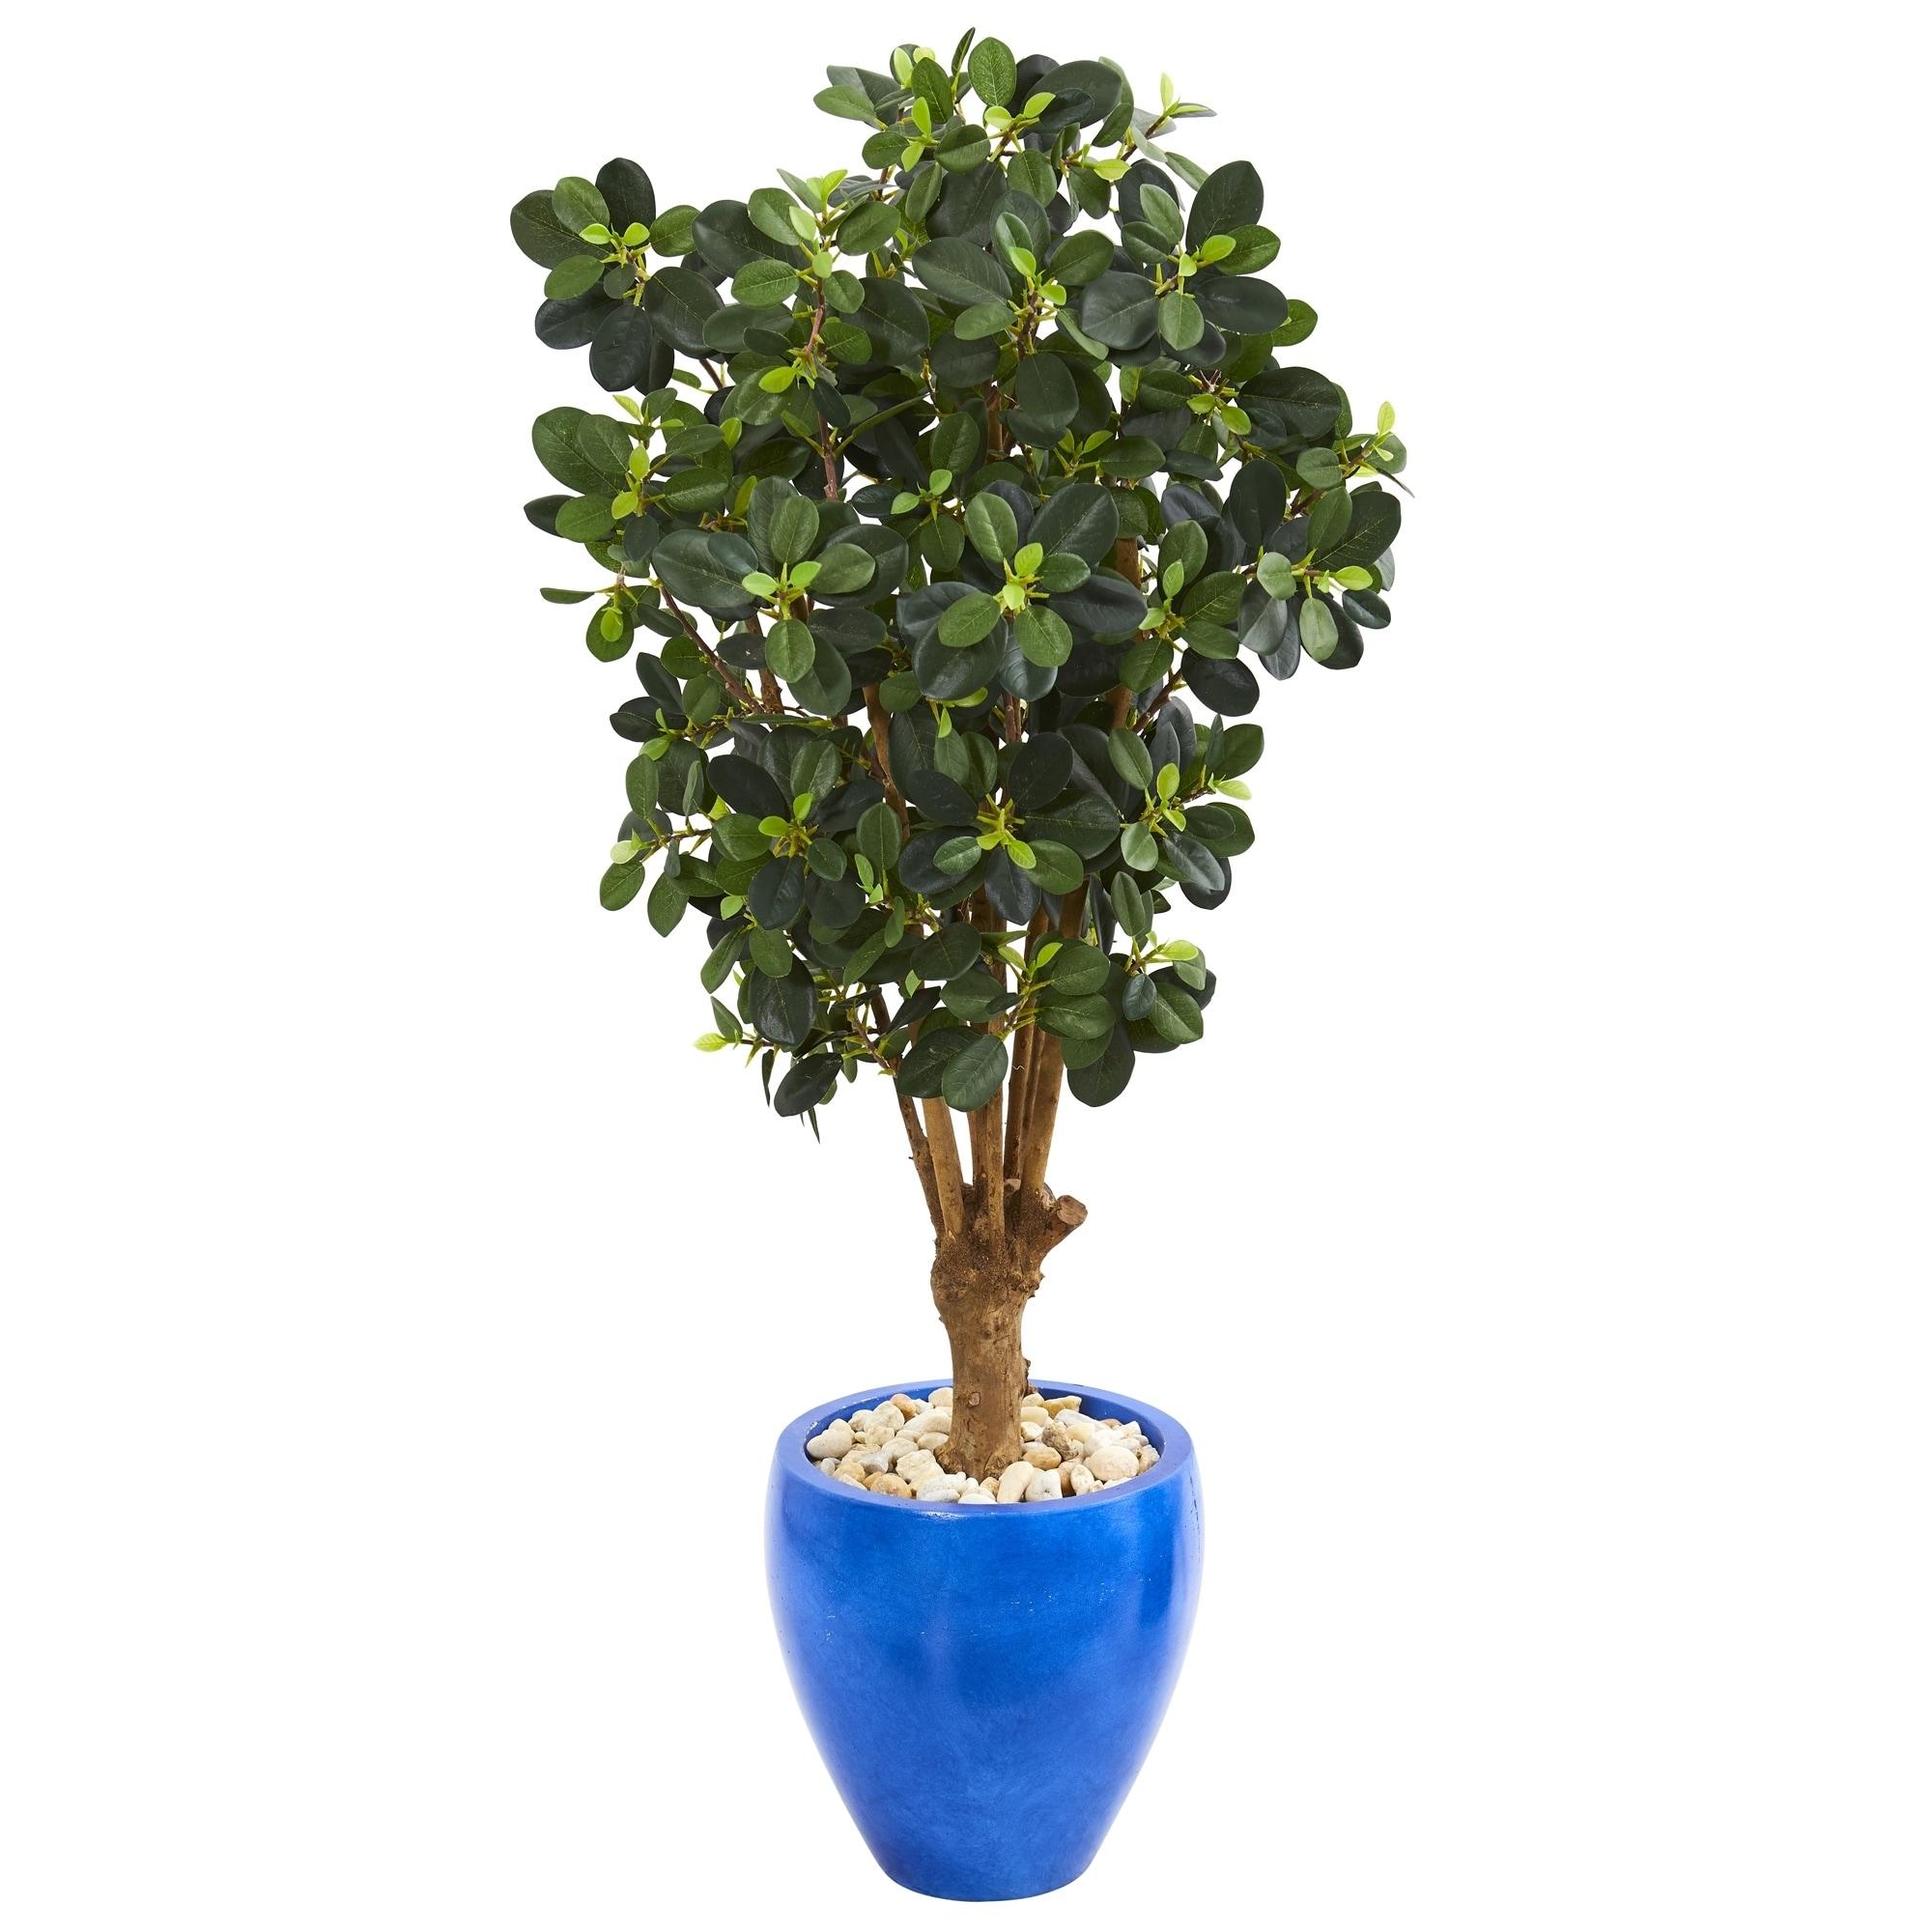 50 Panda Ficus Artificial Tree in Blue Planter